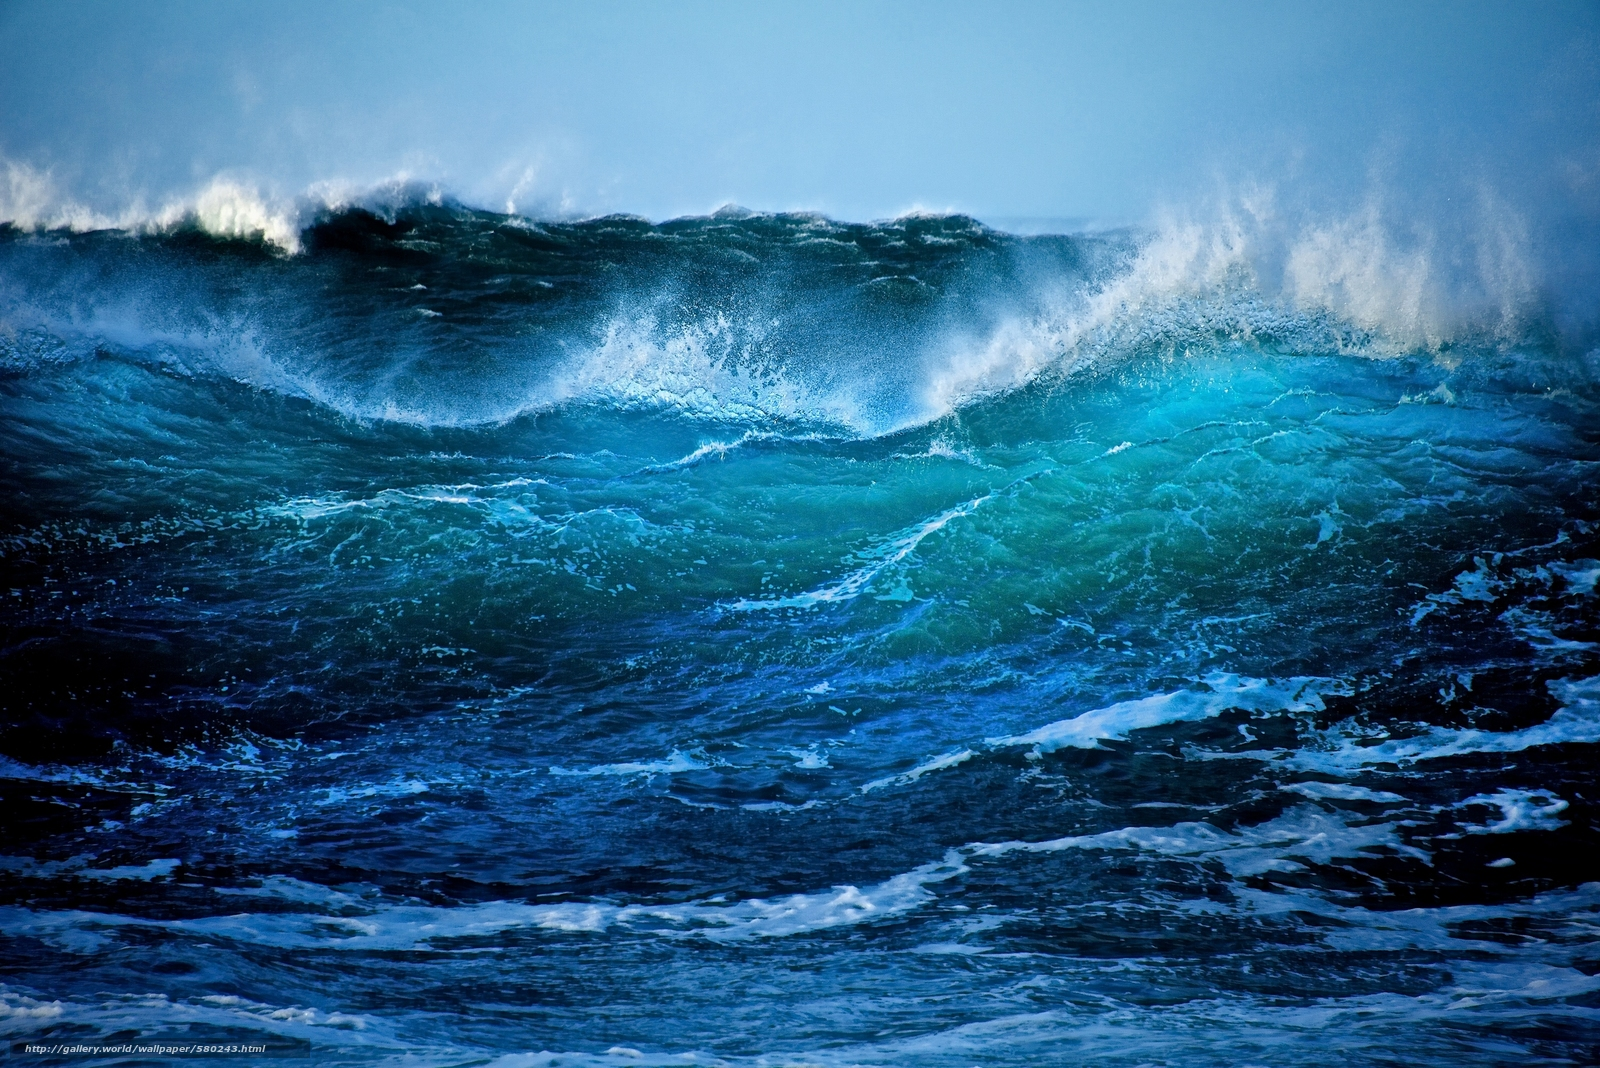 Download wallpaper Northern Ireland Antrim ocean 1600x1068